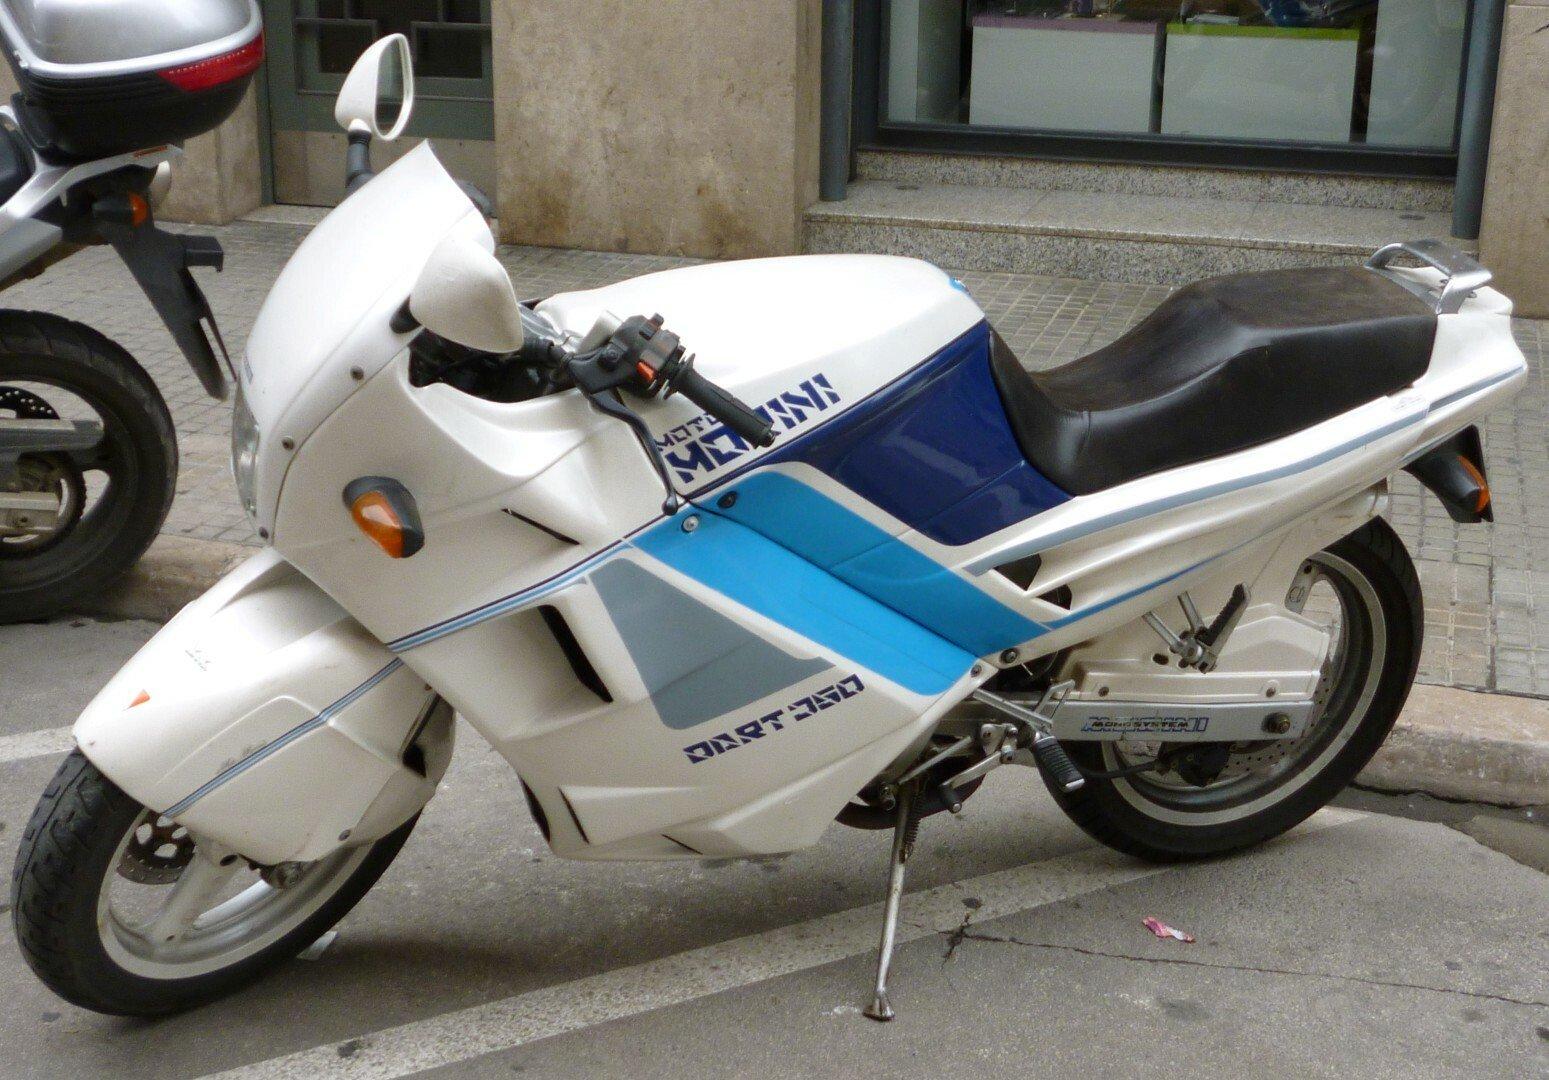 Moto Morini Dart 350 2